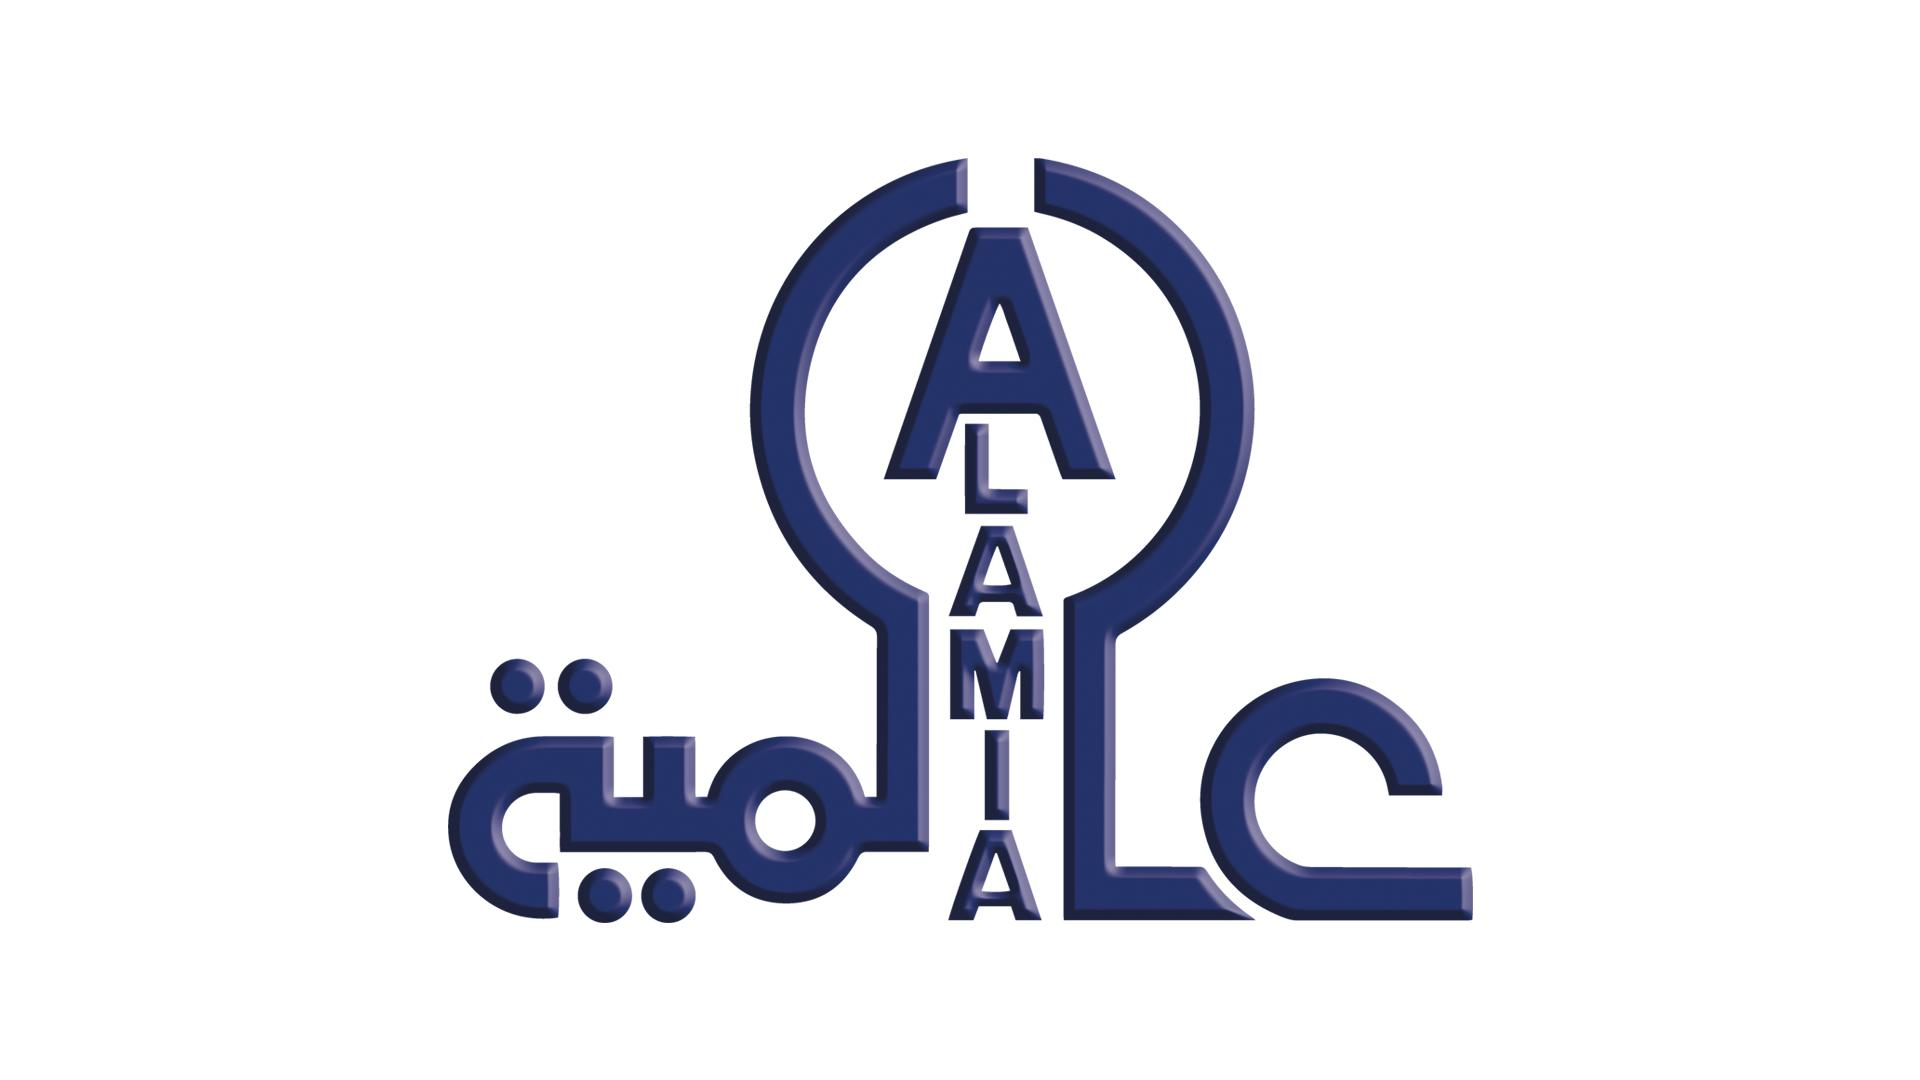 Alamia